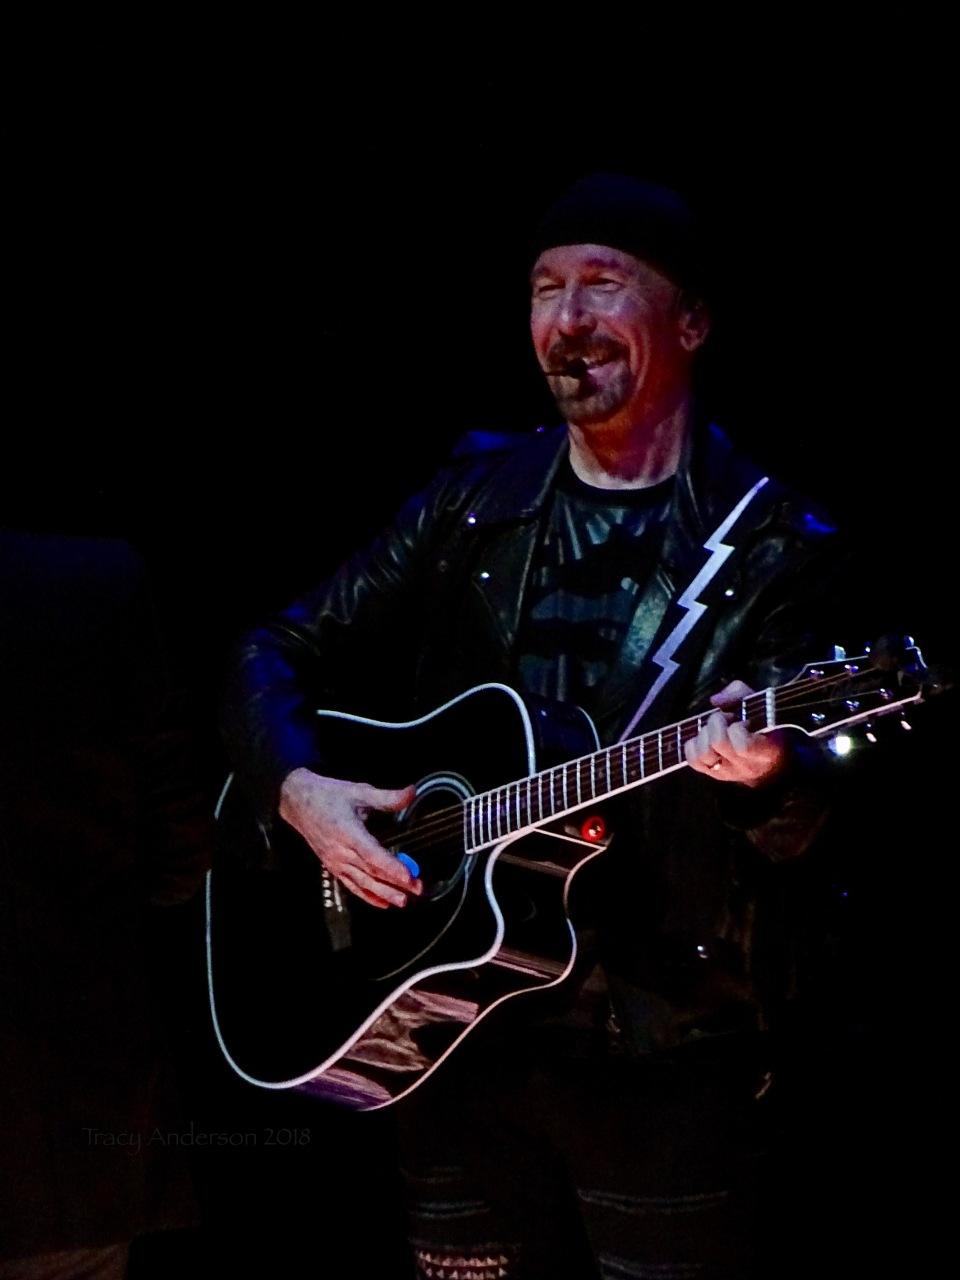 Edge Laughing U2 eXPERIENCE & iNNOCENCE Tour NJ June 29 2018